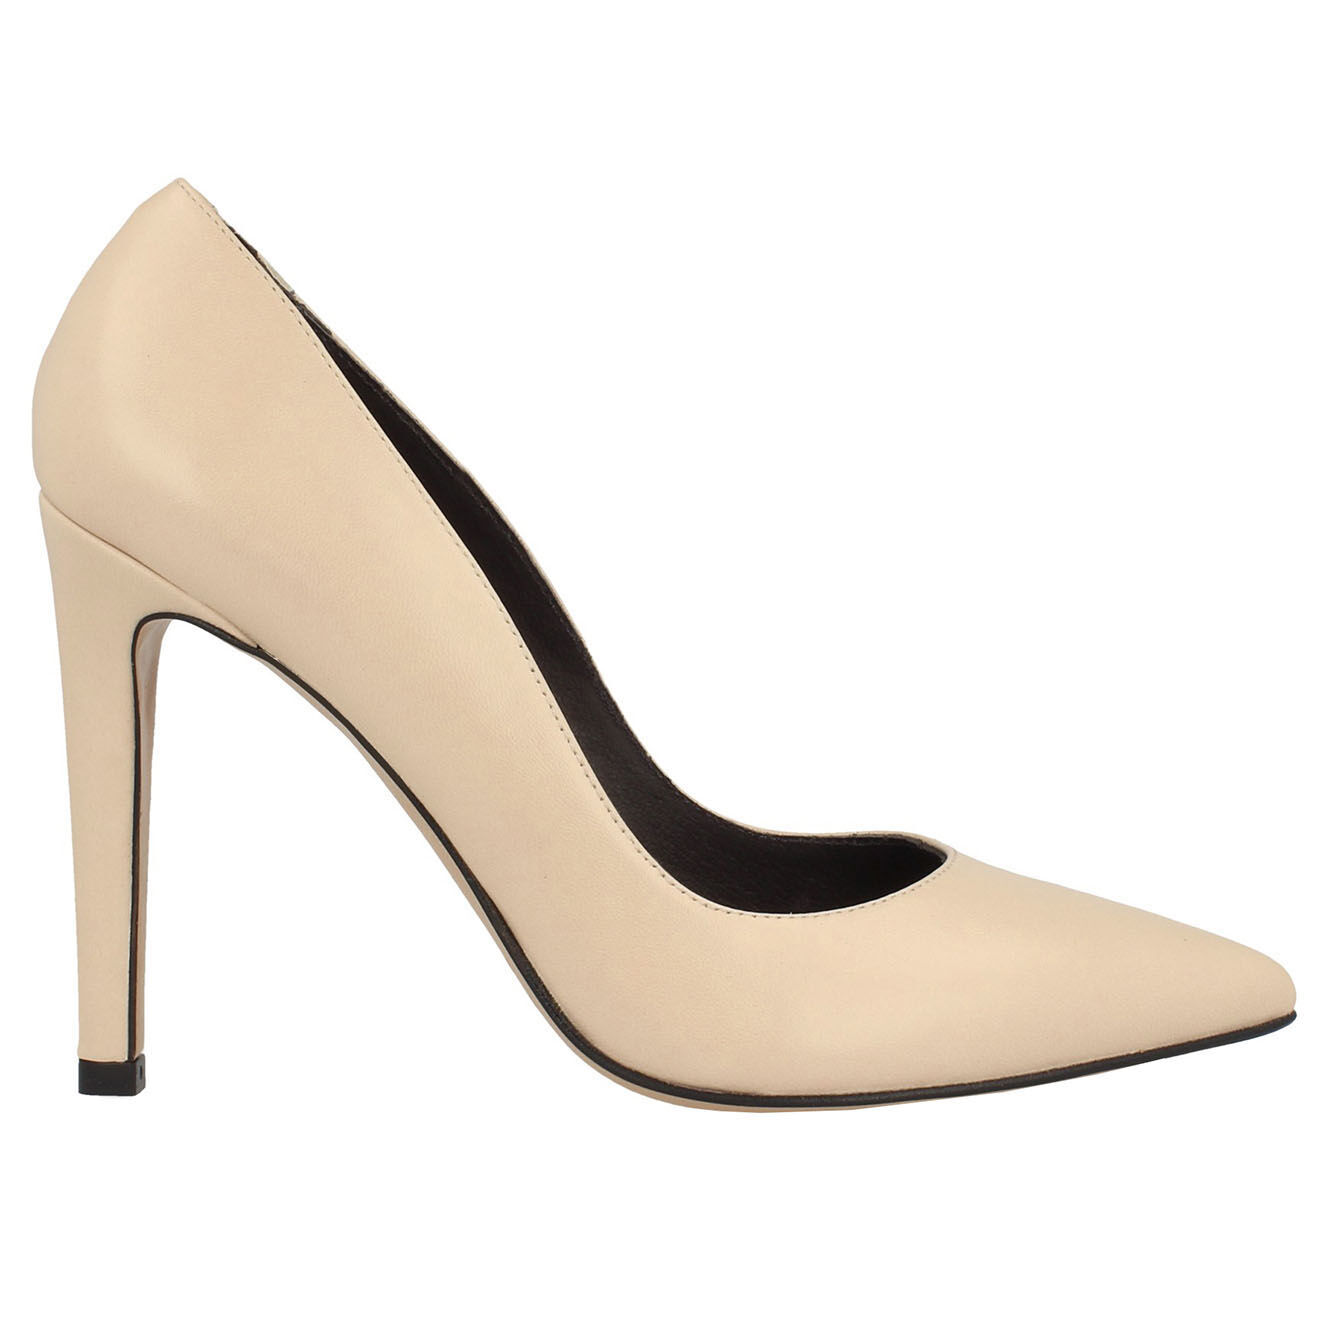 De Femmes 1jcuktlf3 Escarpin Cuir En Catégorie Chaussures La w8XPZkNn0O